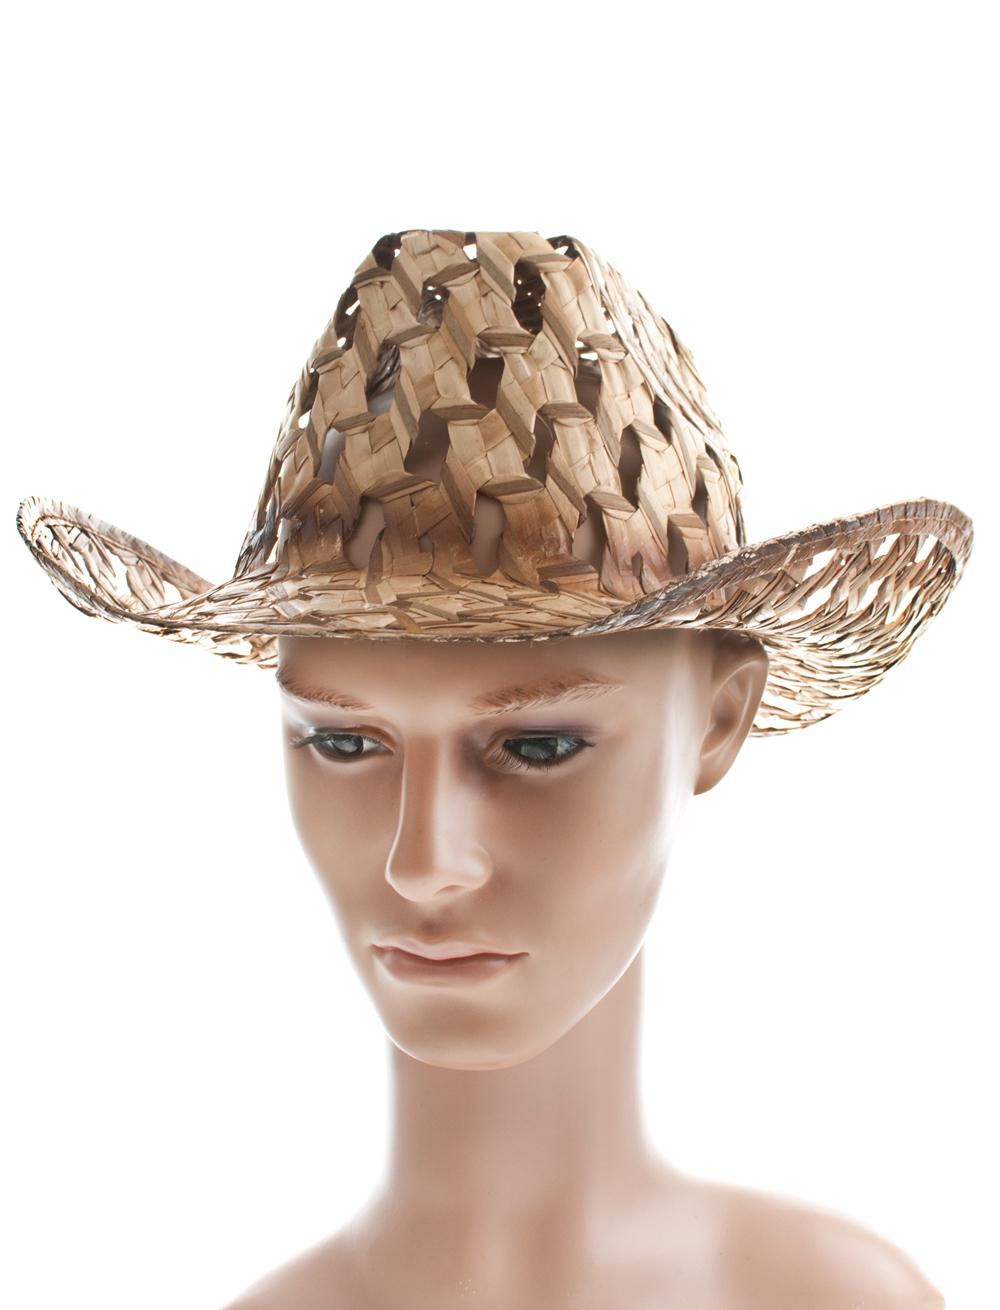 Kostuemzubehor Cowboyhut Crocodile Farbe: braun